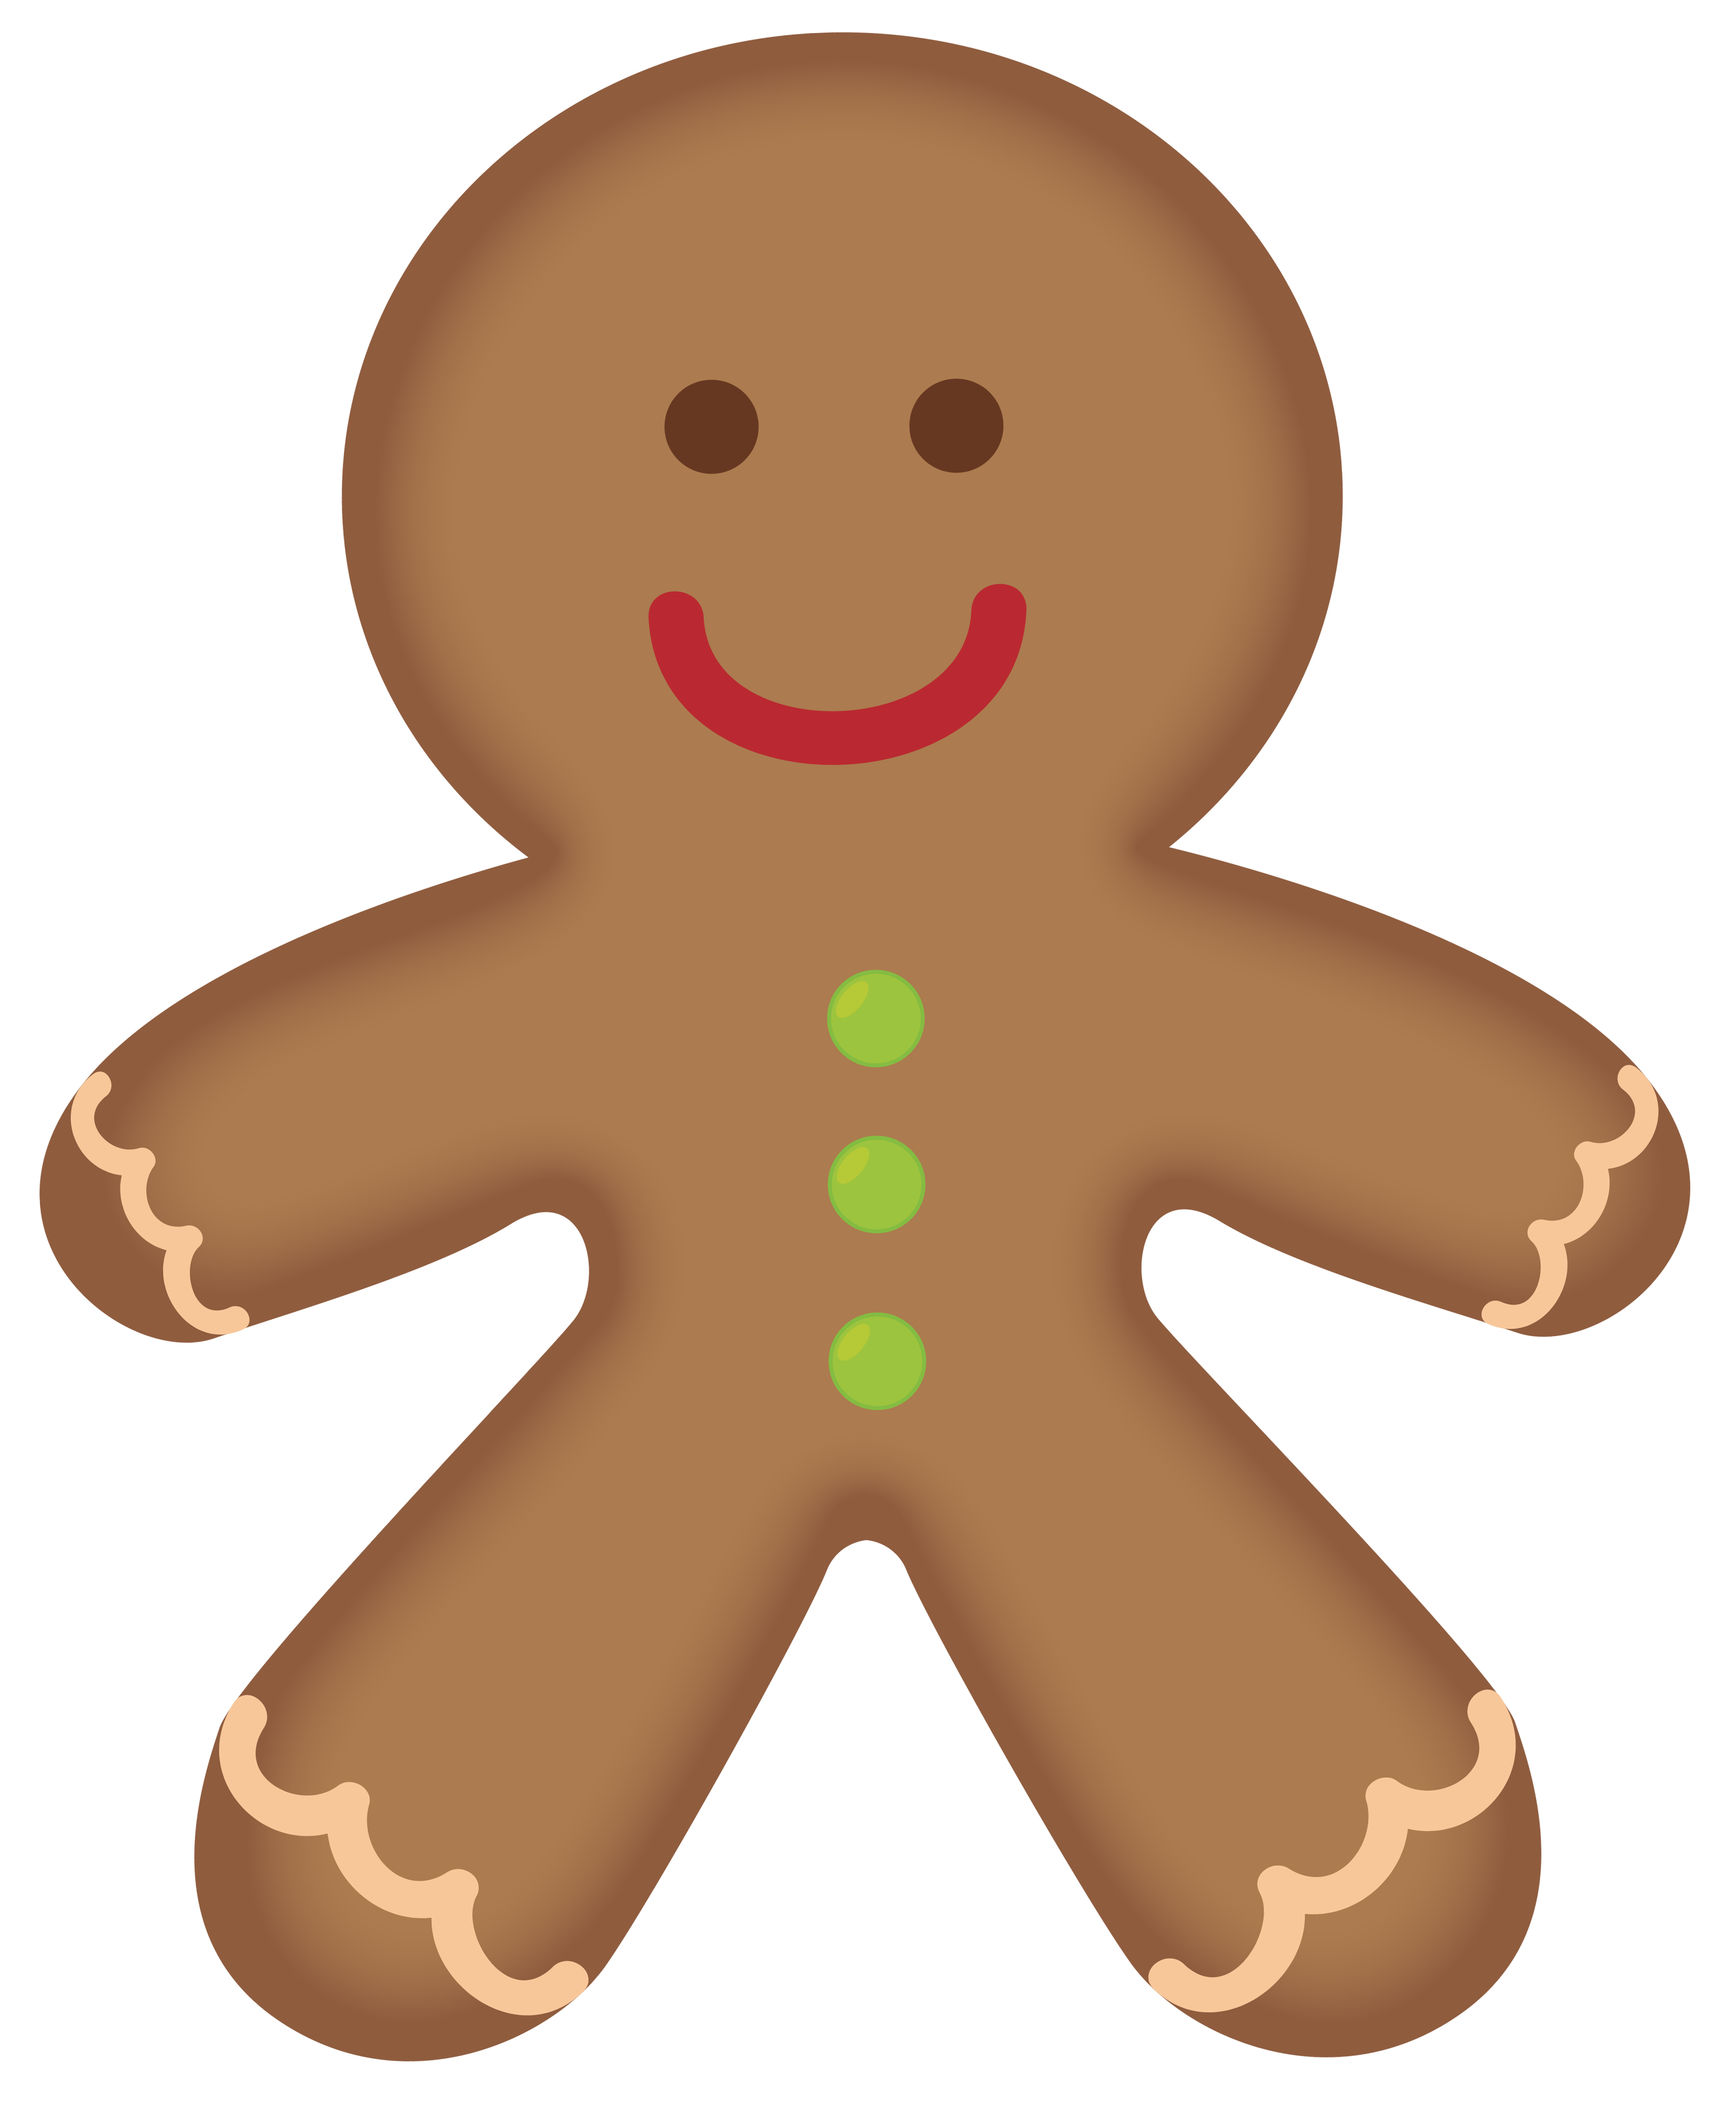 gingerbread man gingerbread men clipart web clipart clipartix rh pinterest co uk Christmas Gingerbread Man Candyland Gingerbread Man Clip Art